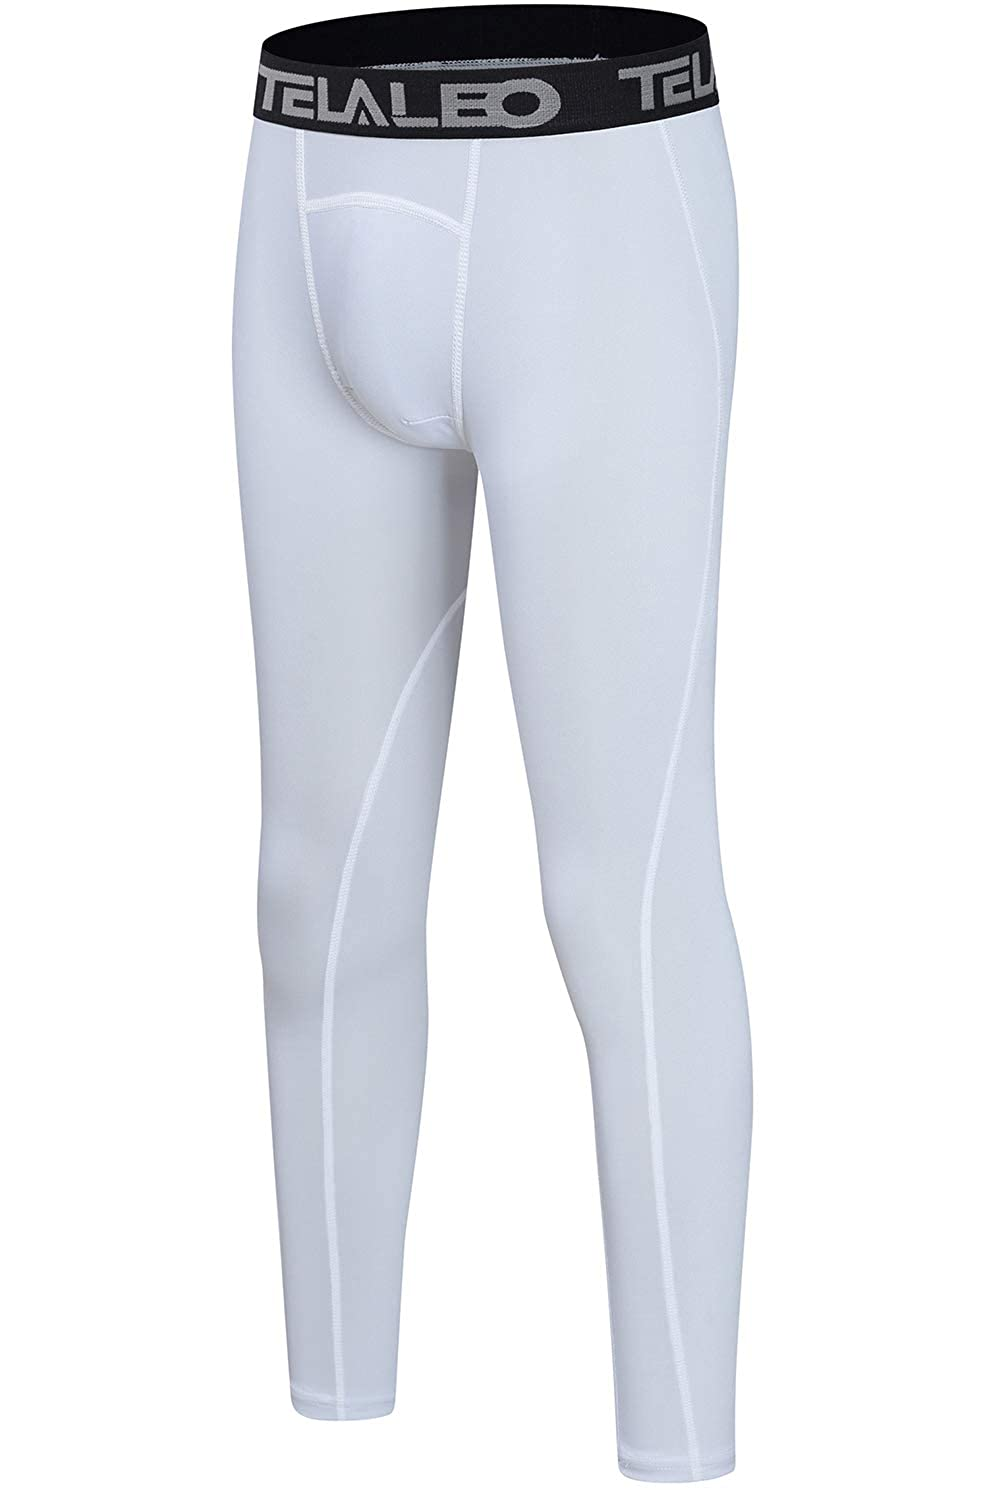 TELALEO Boys Compression Leggings Thermal Fleece Base Layer Tights Cold Gear Pants NO Fireball on Leg